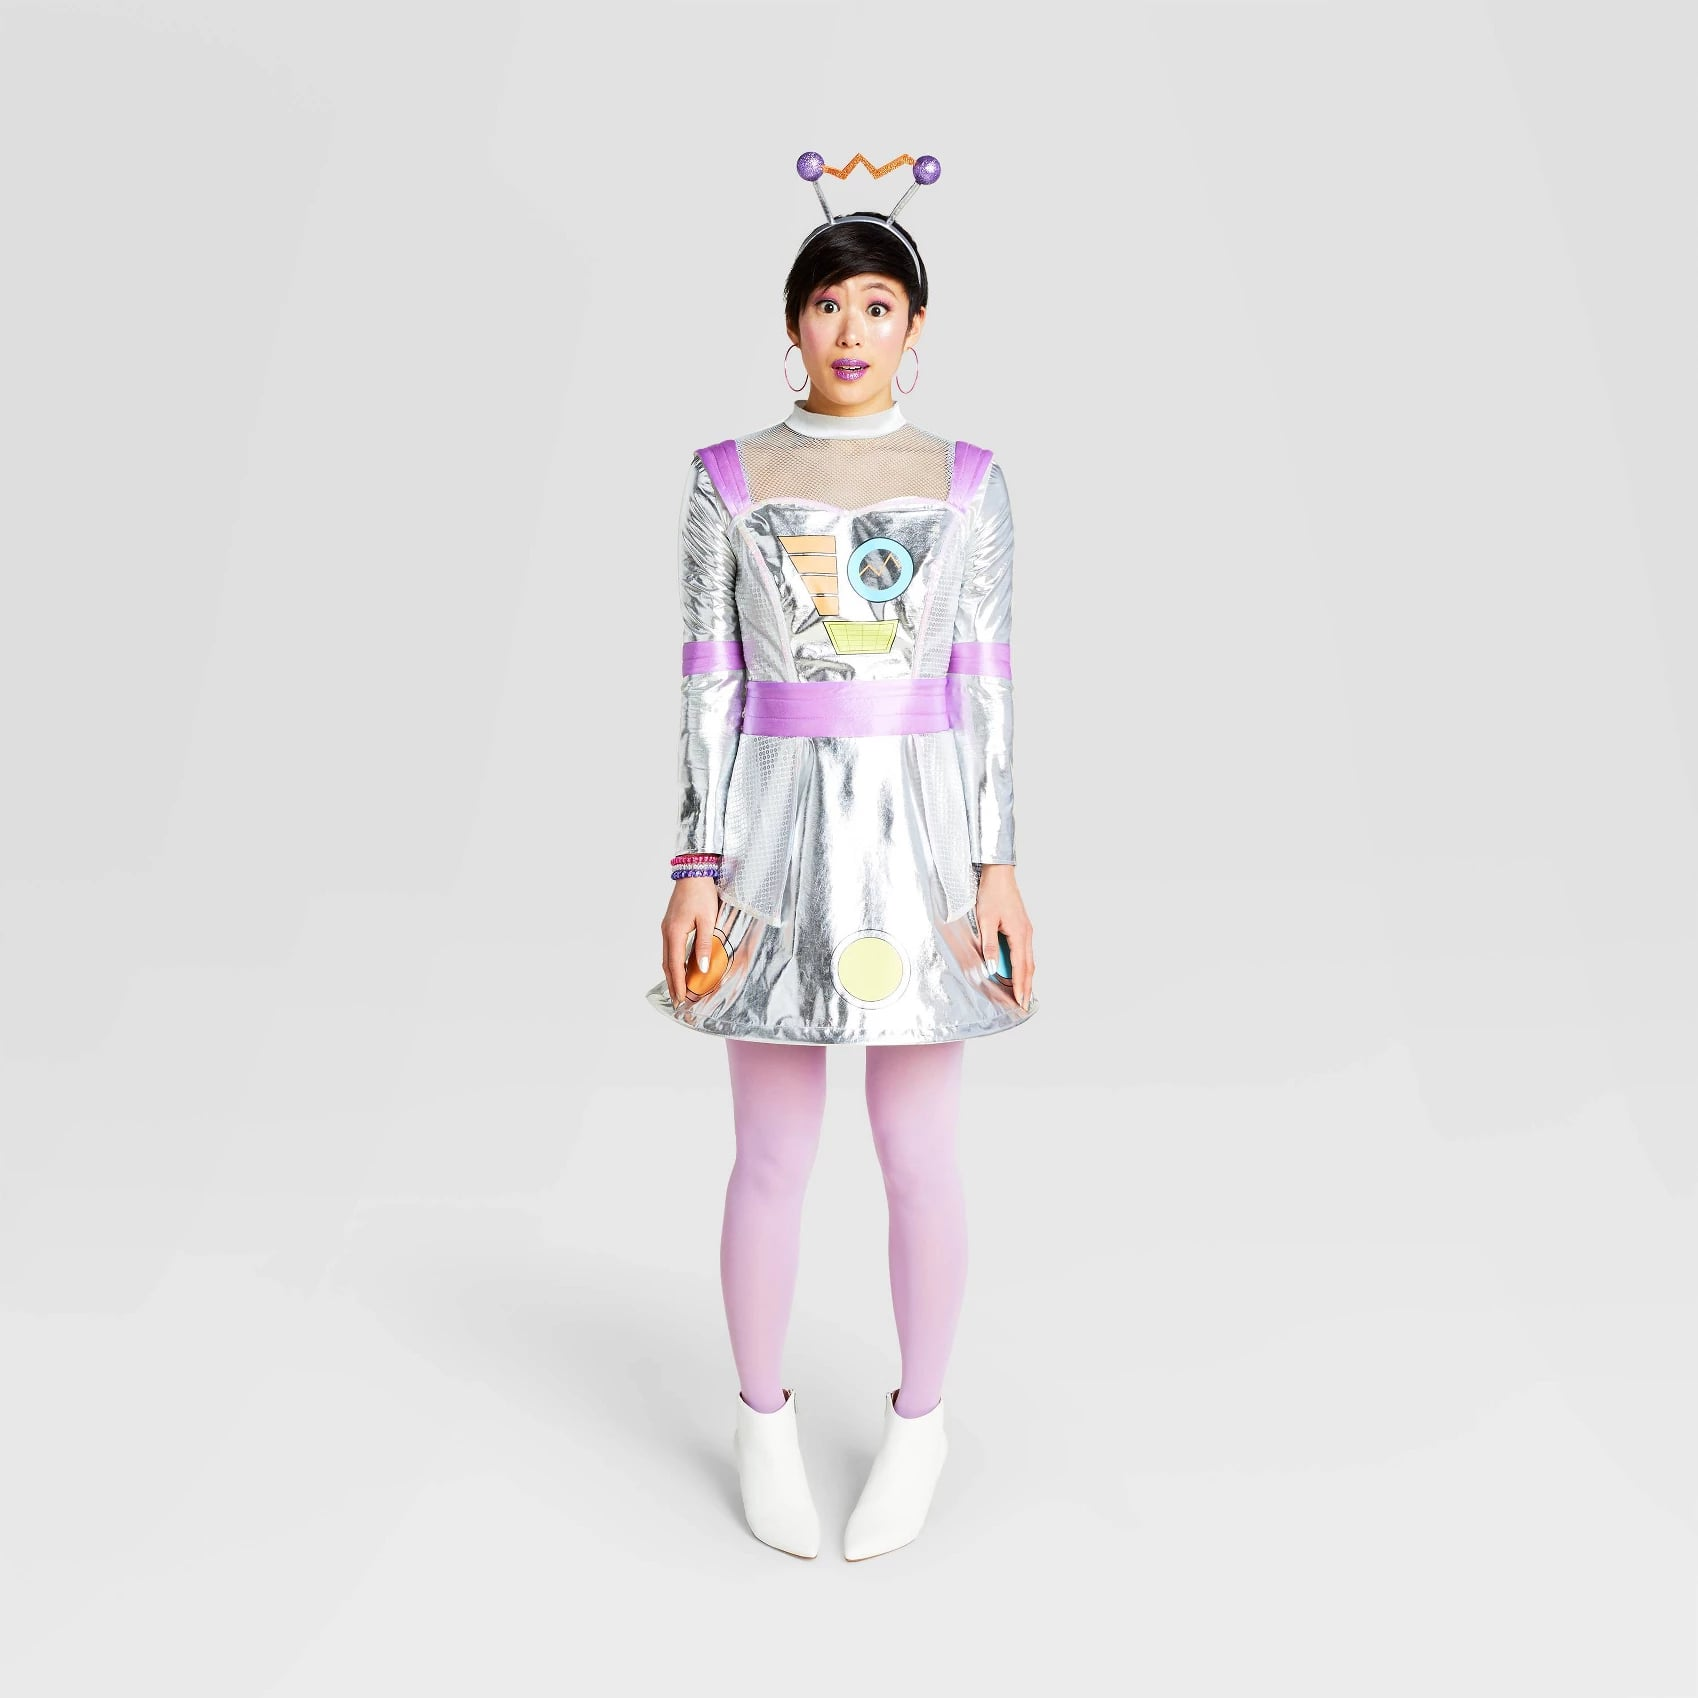 Costume Halloween Robot.Adult Robot Halloween Costume Target Has Halloween Costumes For The Whole Family Even Fido See 2020 S Best Popsugar Family Photo 63